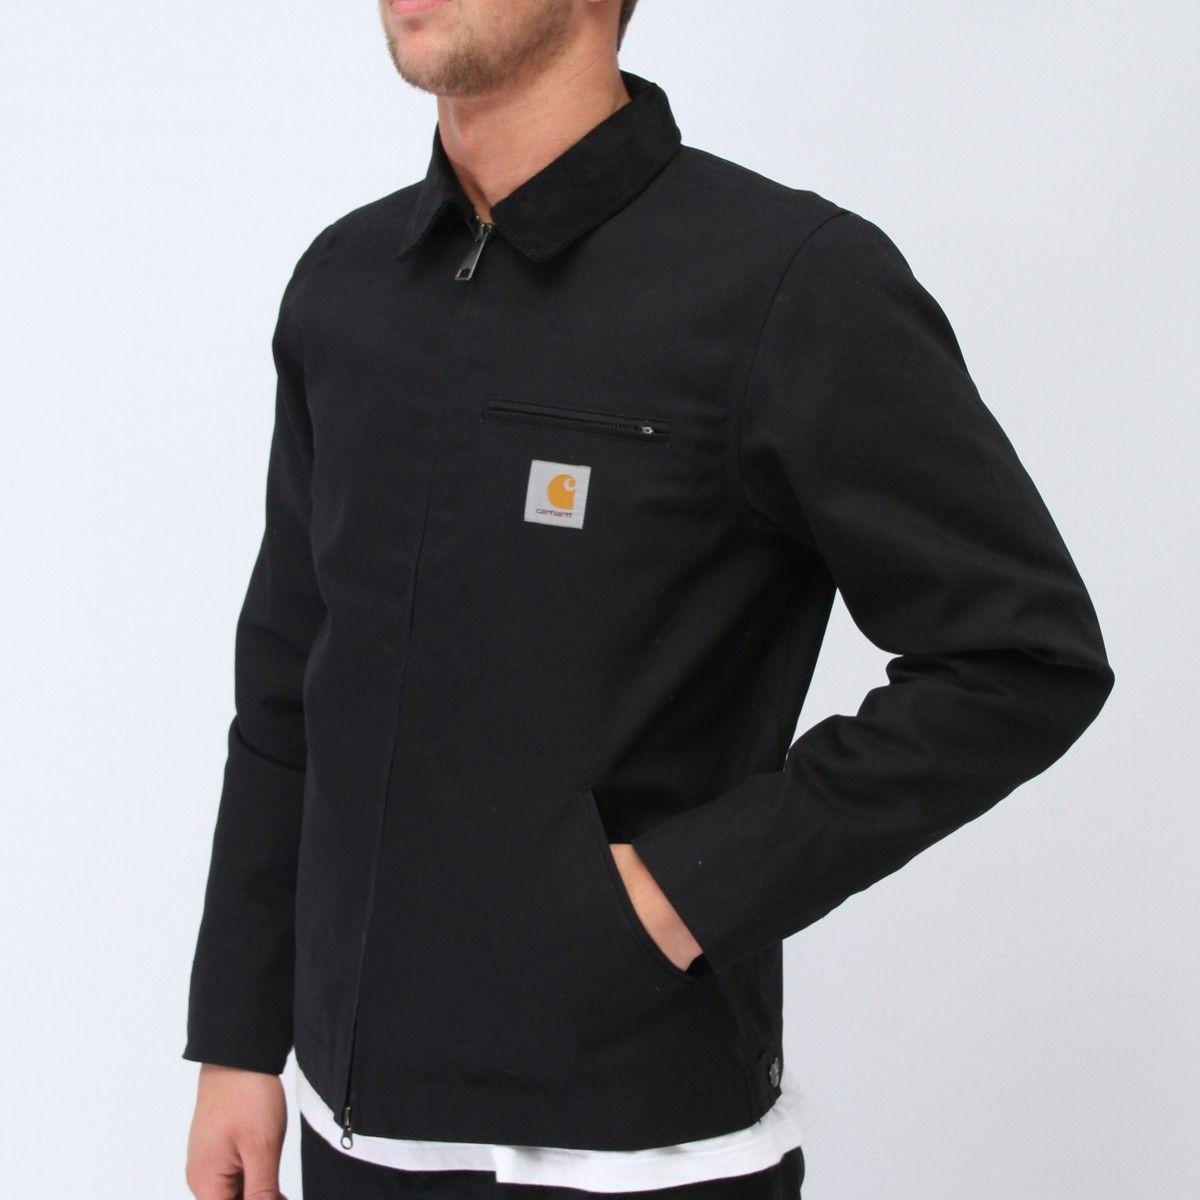 58086810c68 Carhartt Detroit Jacket Black | fashion | Carhartt detroit jacket ...